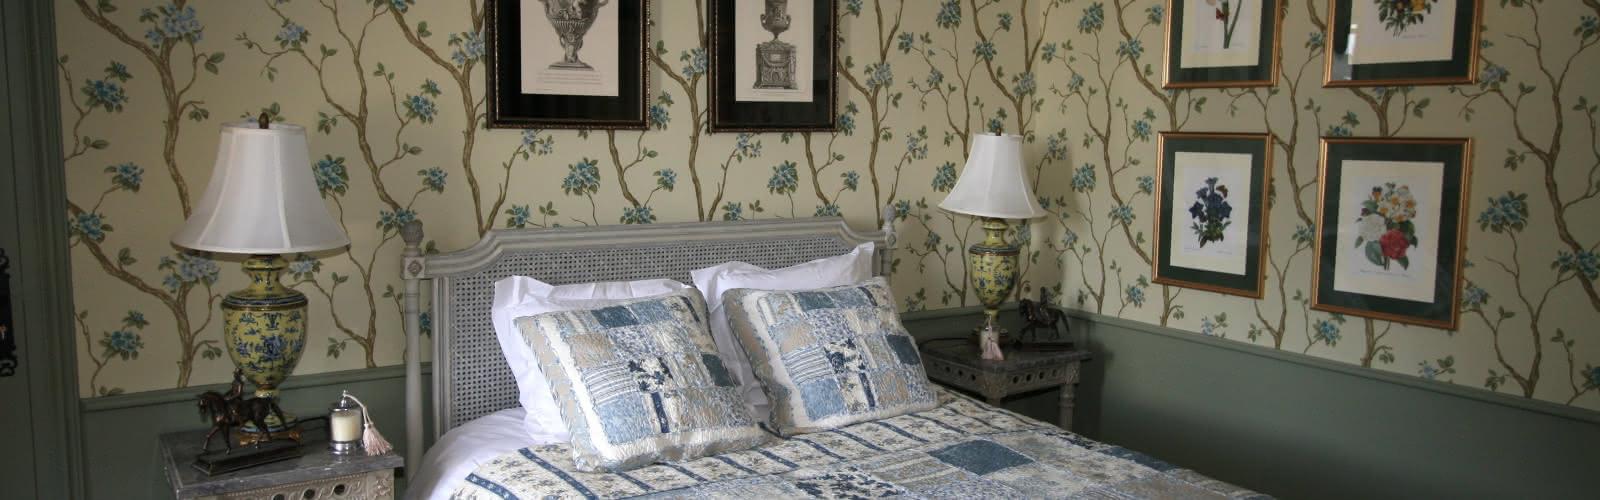 Chambre d'hôtes Renoir-La Rochefoucauld